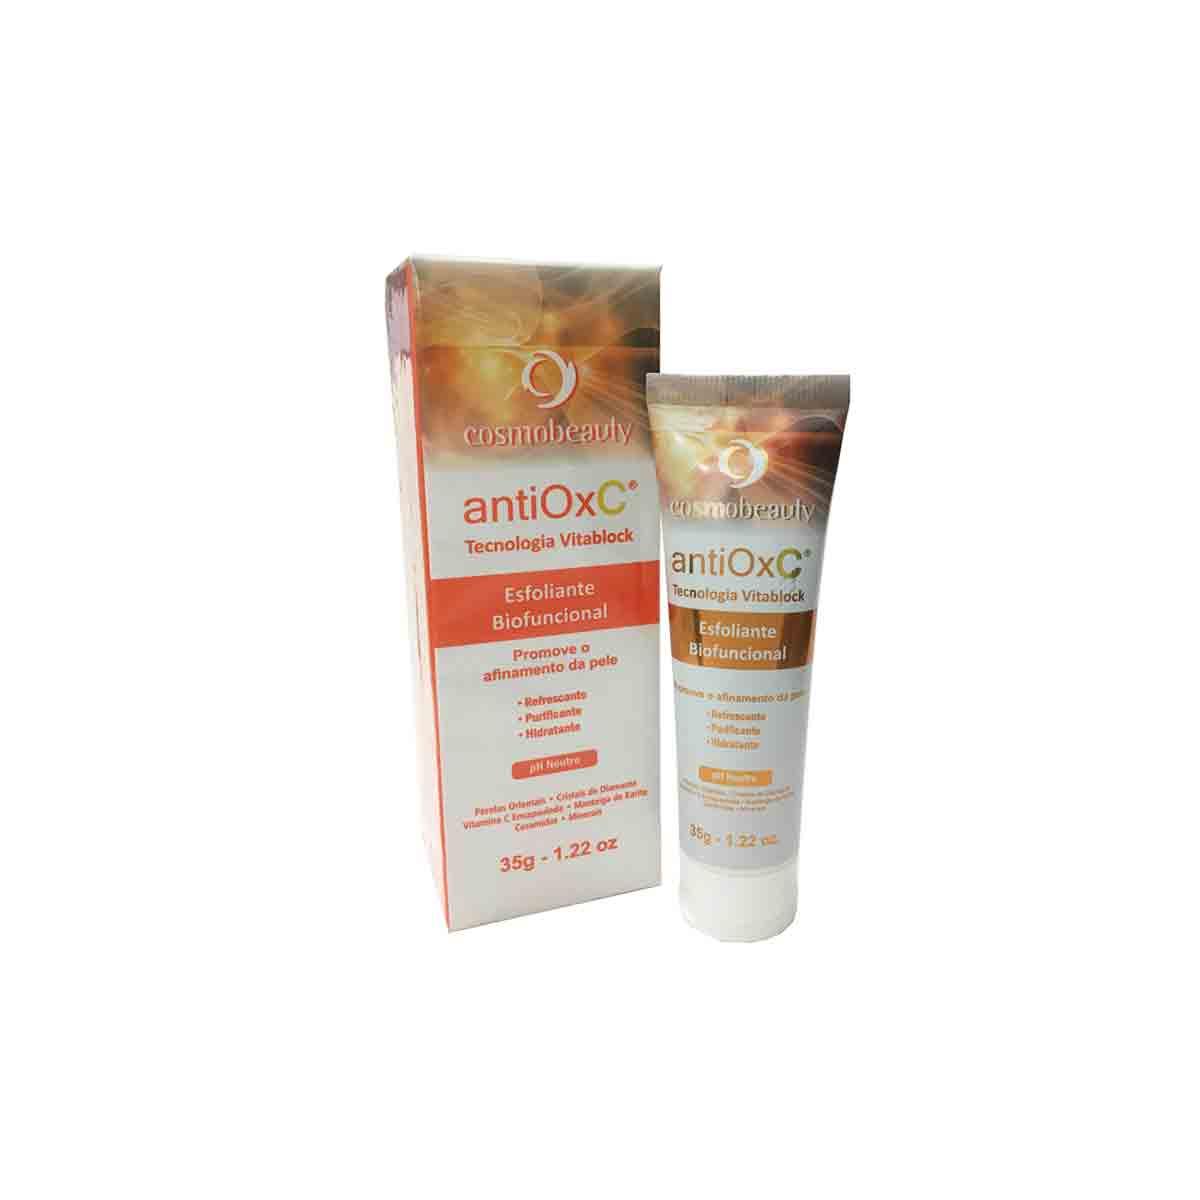 Antiox C Esfoliante Biofuncional  35g